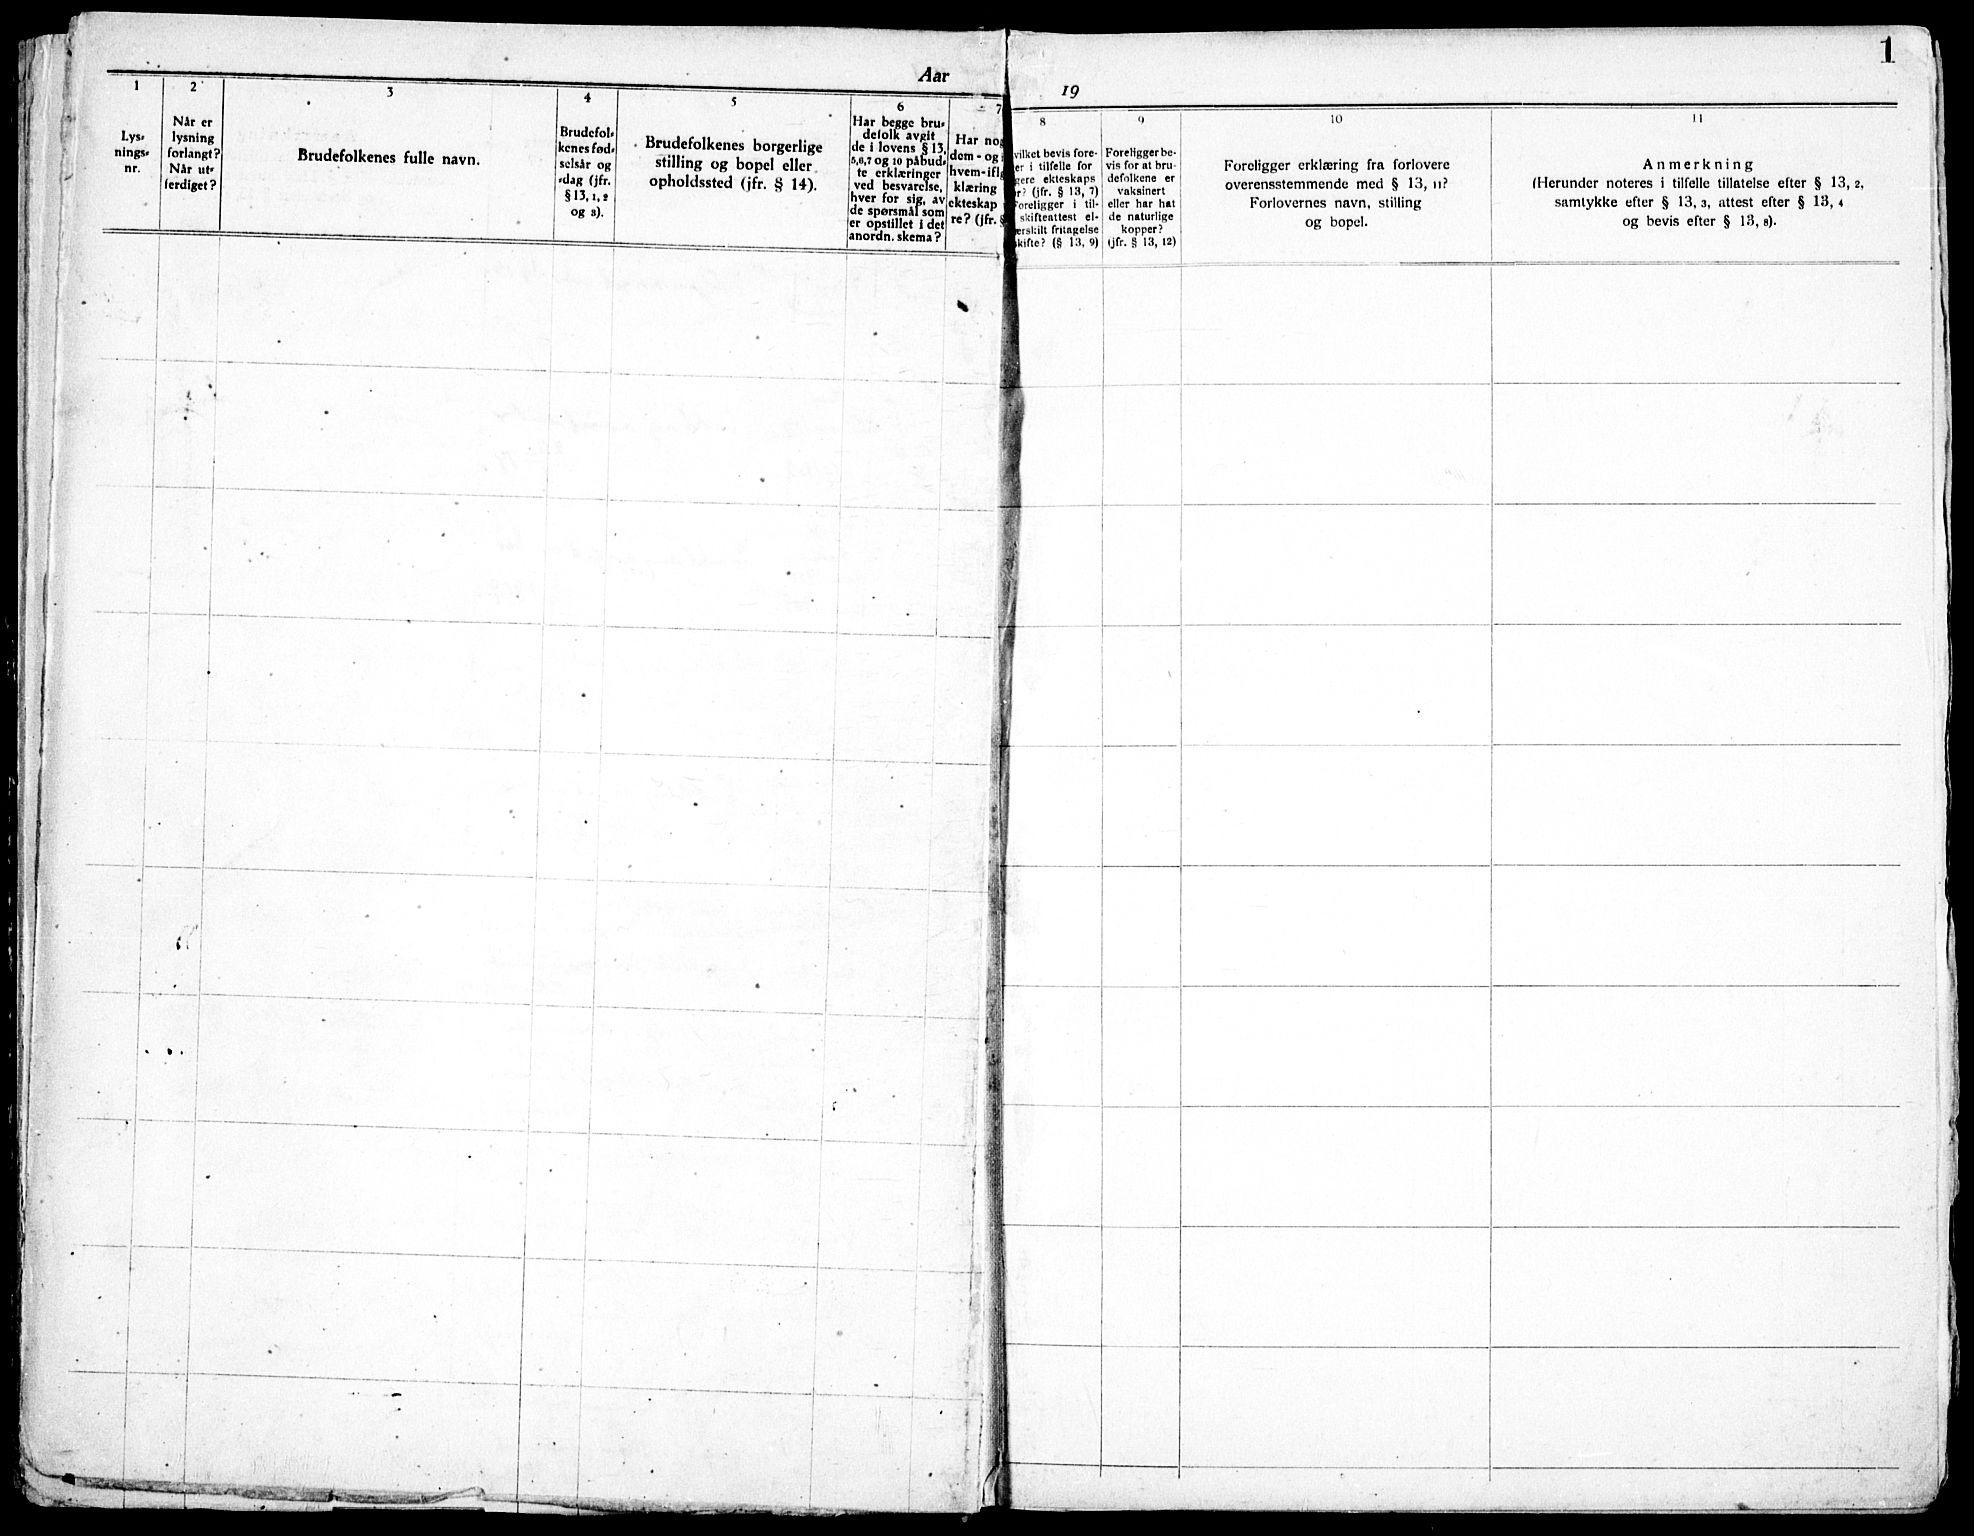 SAO, Skedsmo prestekontor Kirkebøker, H/Hc/L0001: Lysningsprotokoll nr. III 1, 1919-1938, s. 1